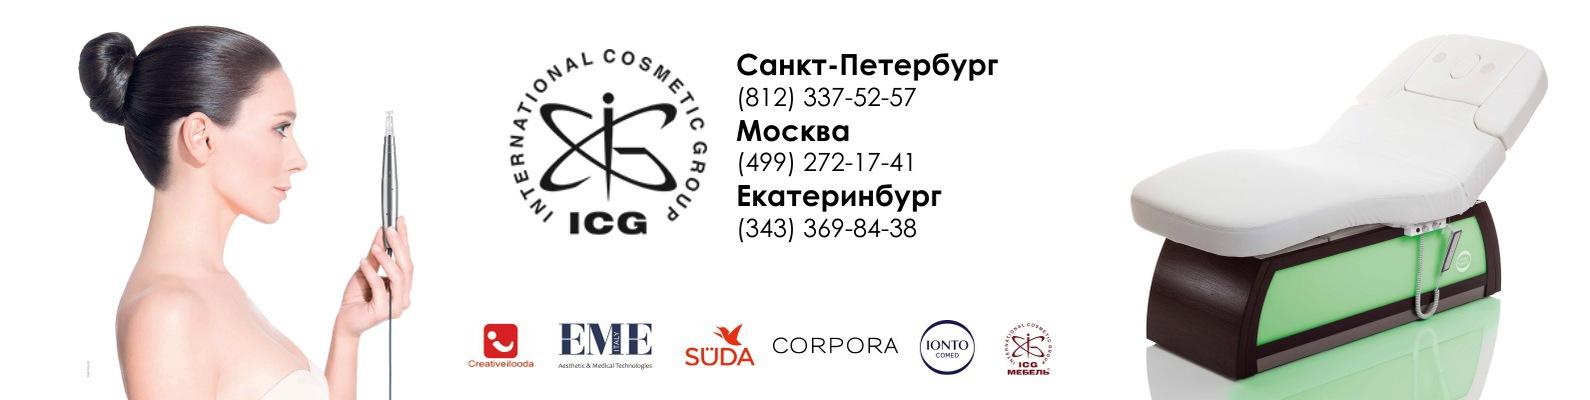 International Cosmetic Group